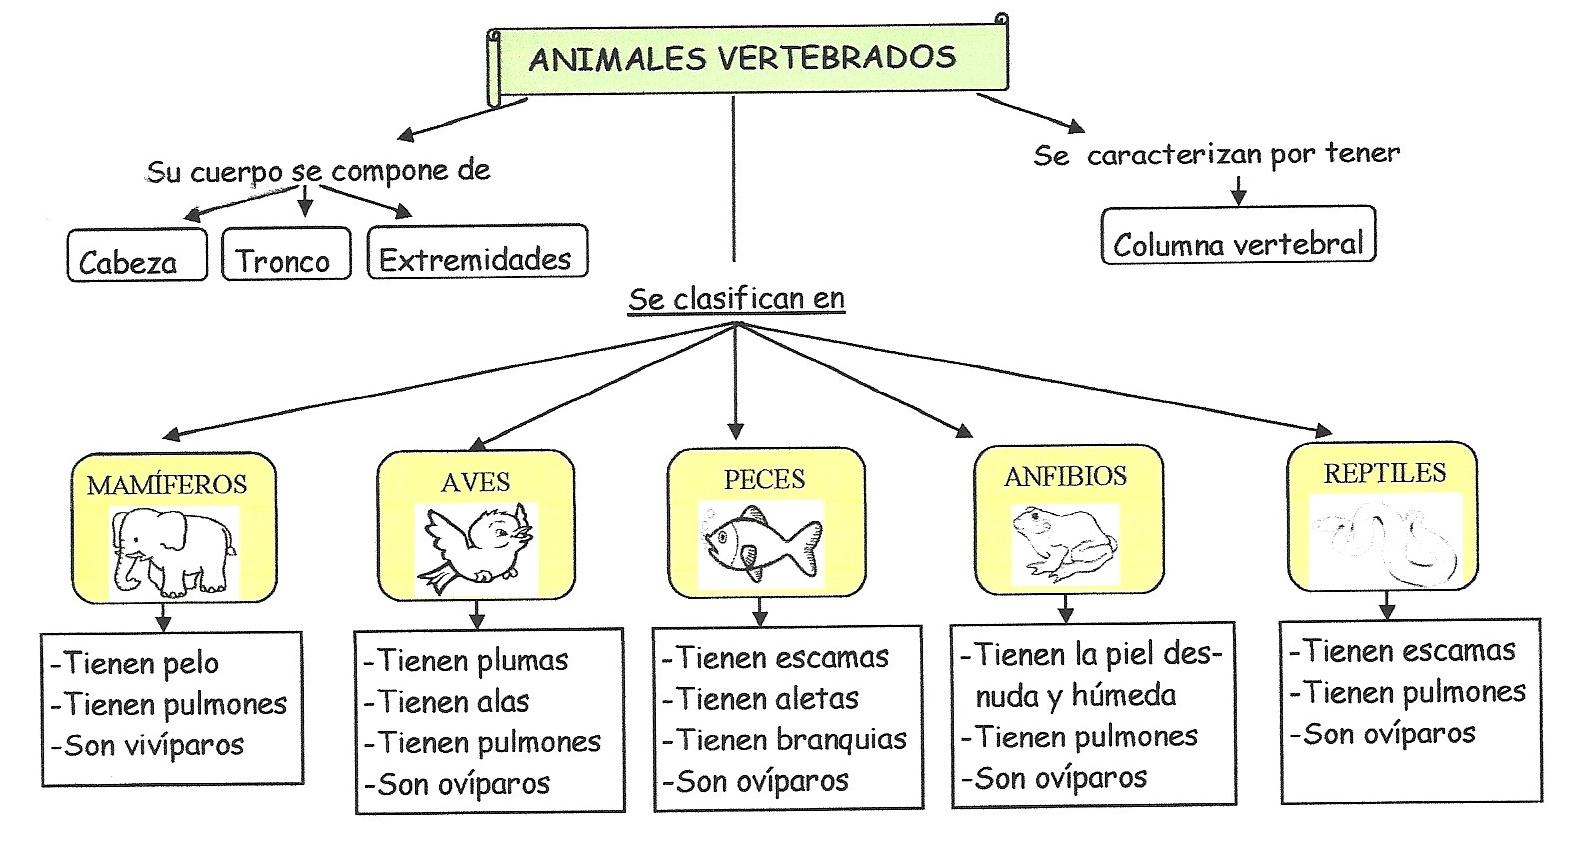 animalesesquema vertebrados